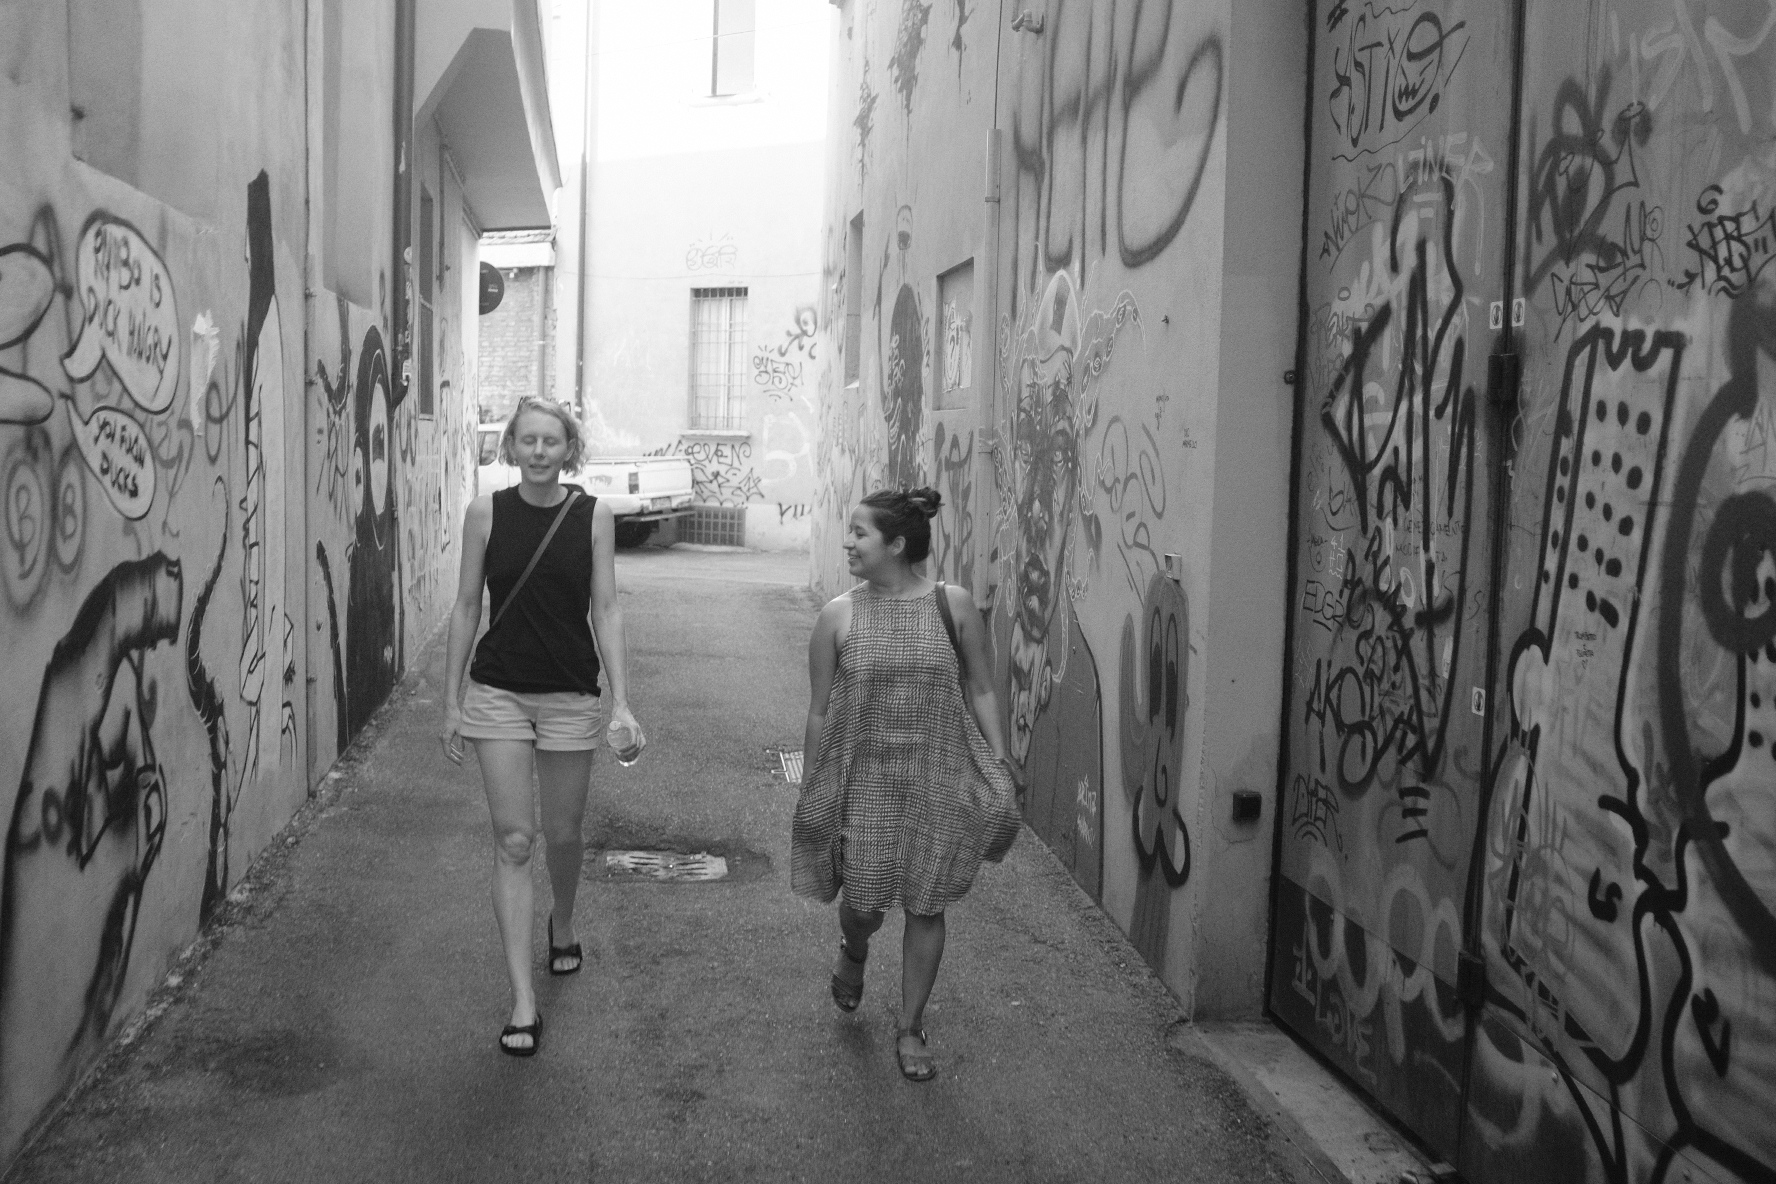 Bologna_MandS_Alley.JPG